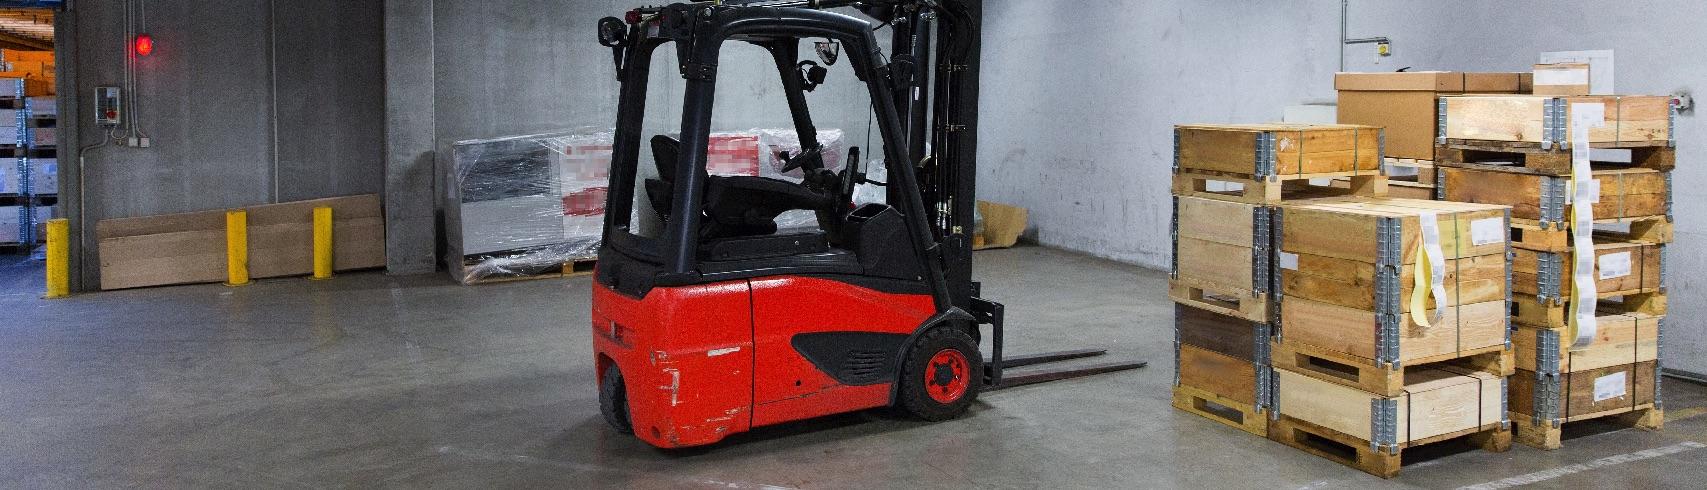 Forklift Rental San Antonio, TX - Tobly Equipment Rental